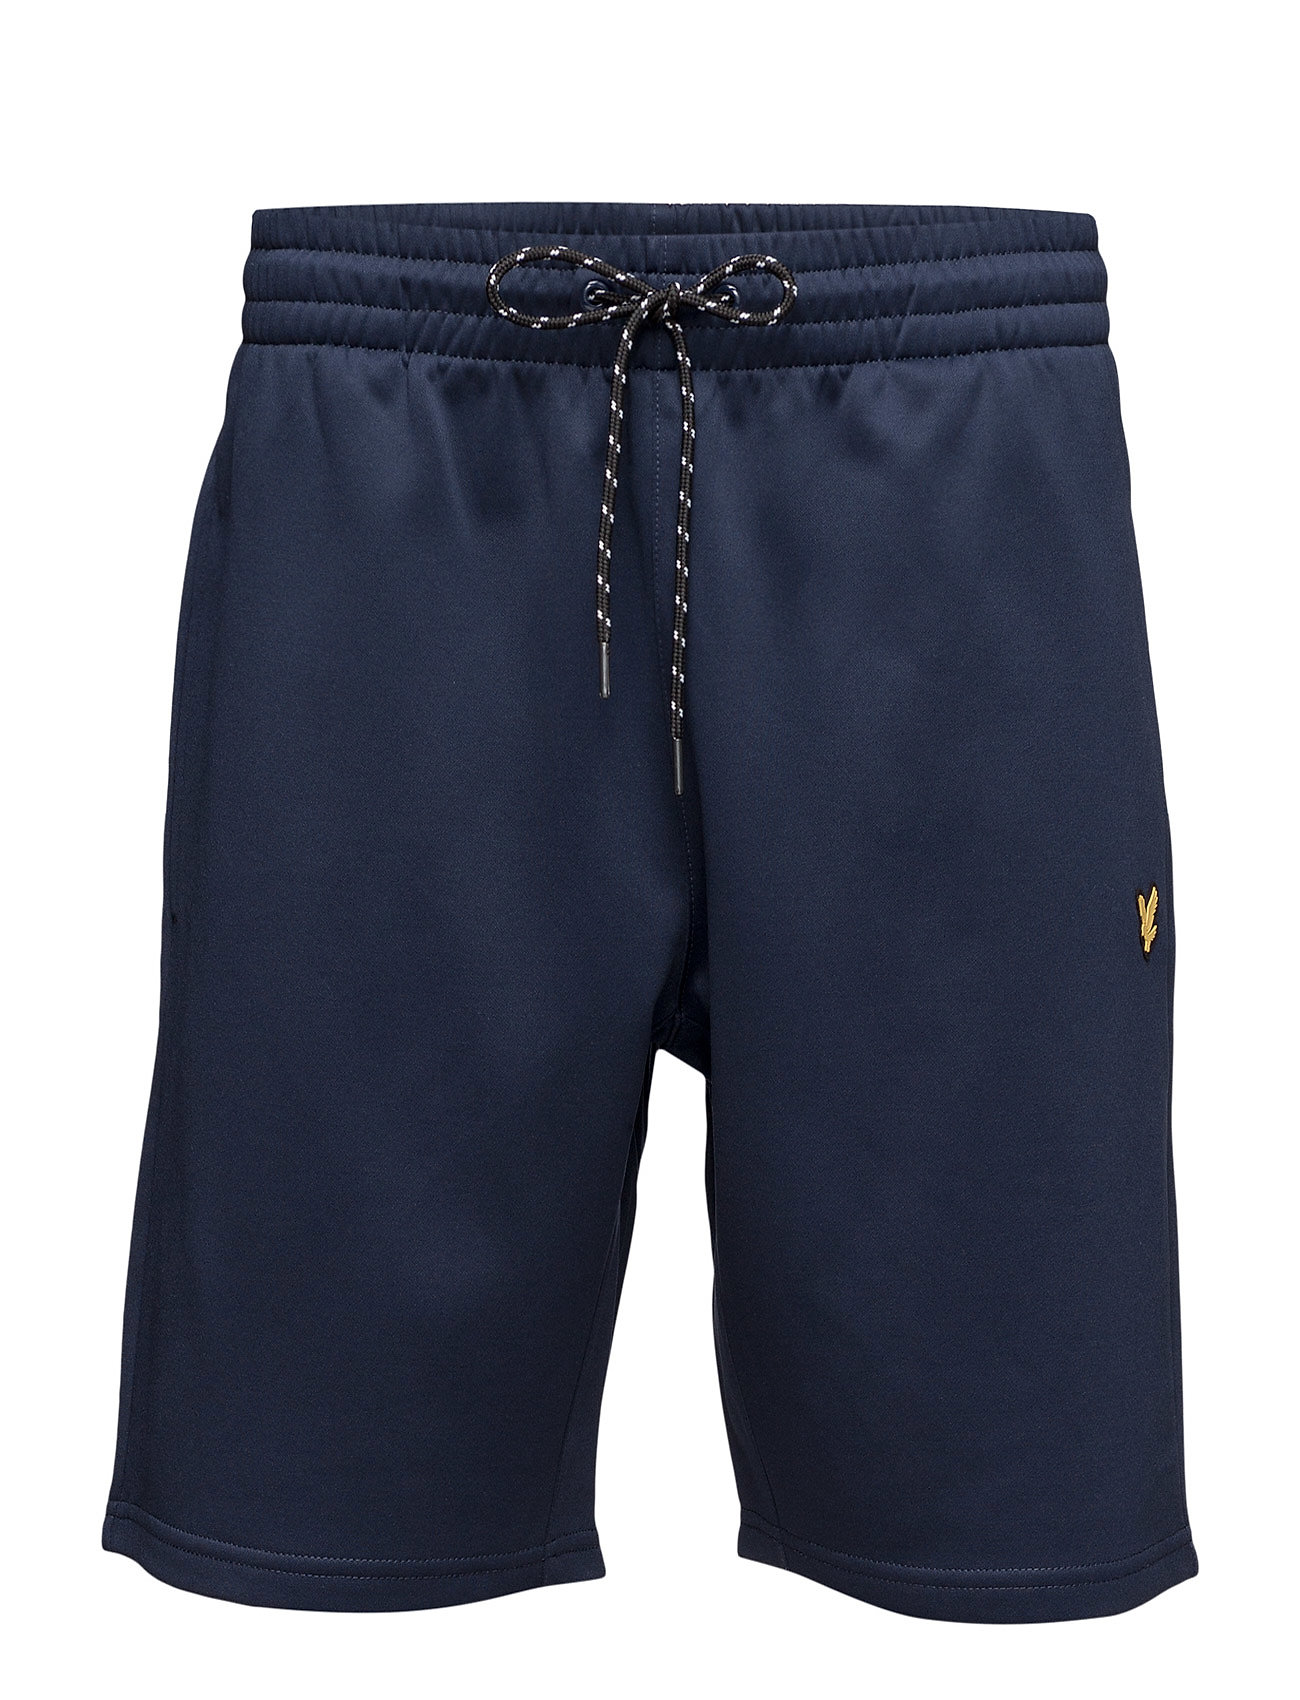 Charlton Fleece Shorts Lyle & Scott Sport Shorts til Mænd i